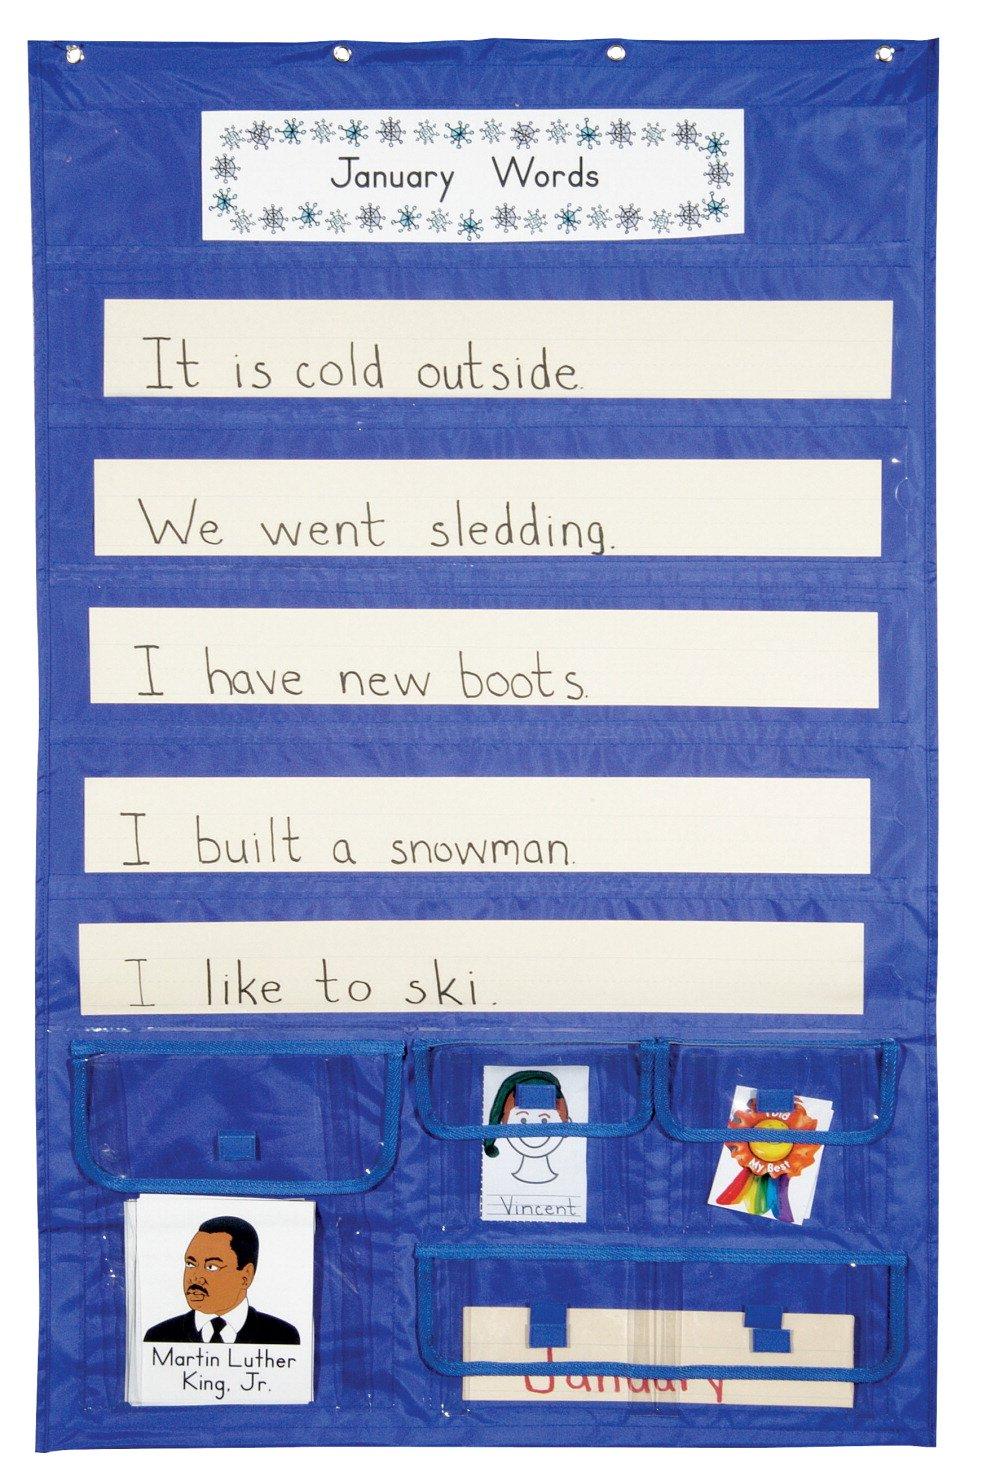 School Smart 387522 Sentence Strip Pocket Chart with Card Storage, 28'' x 44.5''